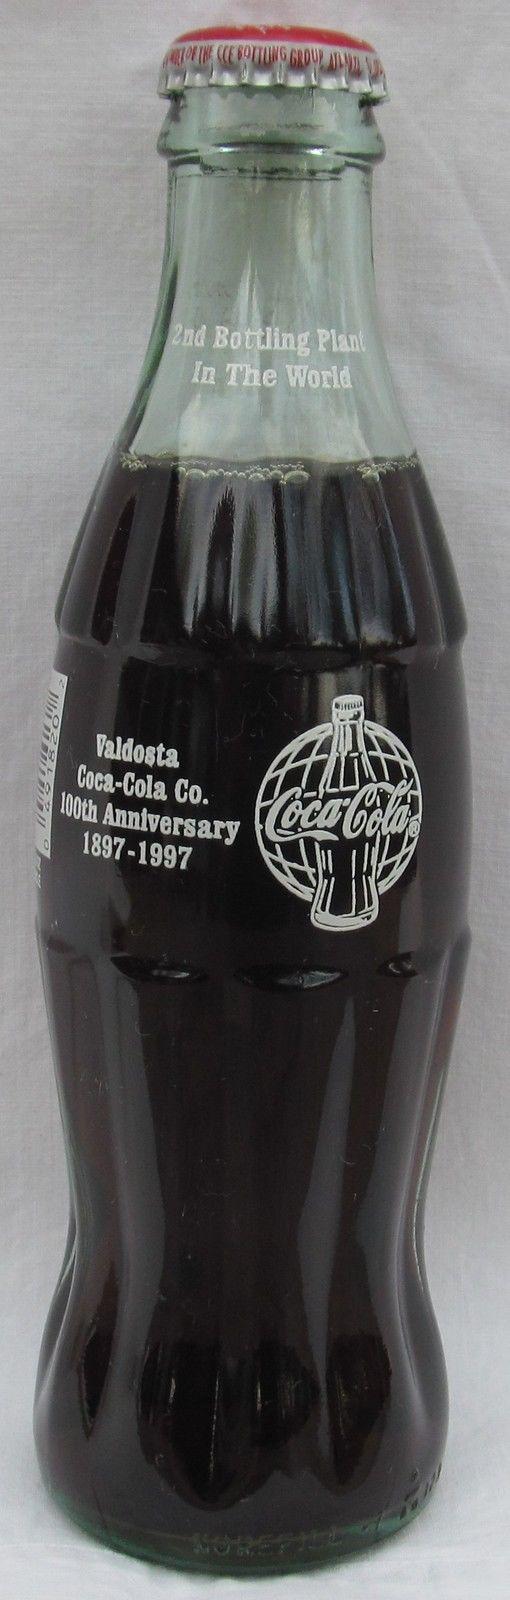 Valdosta Coca-Cola Co 100th Anniversary 1897-1997 COKE Bottle 2nd Bottling Plant